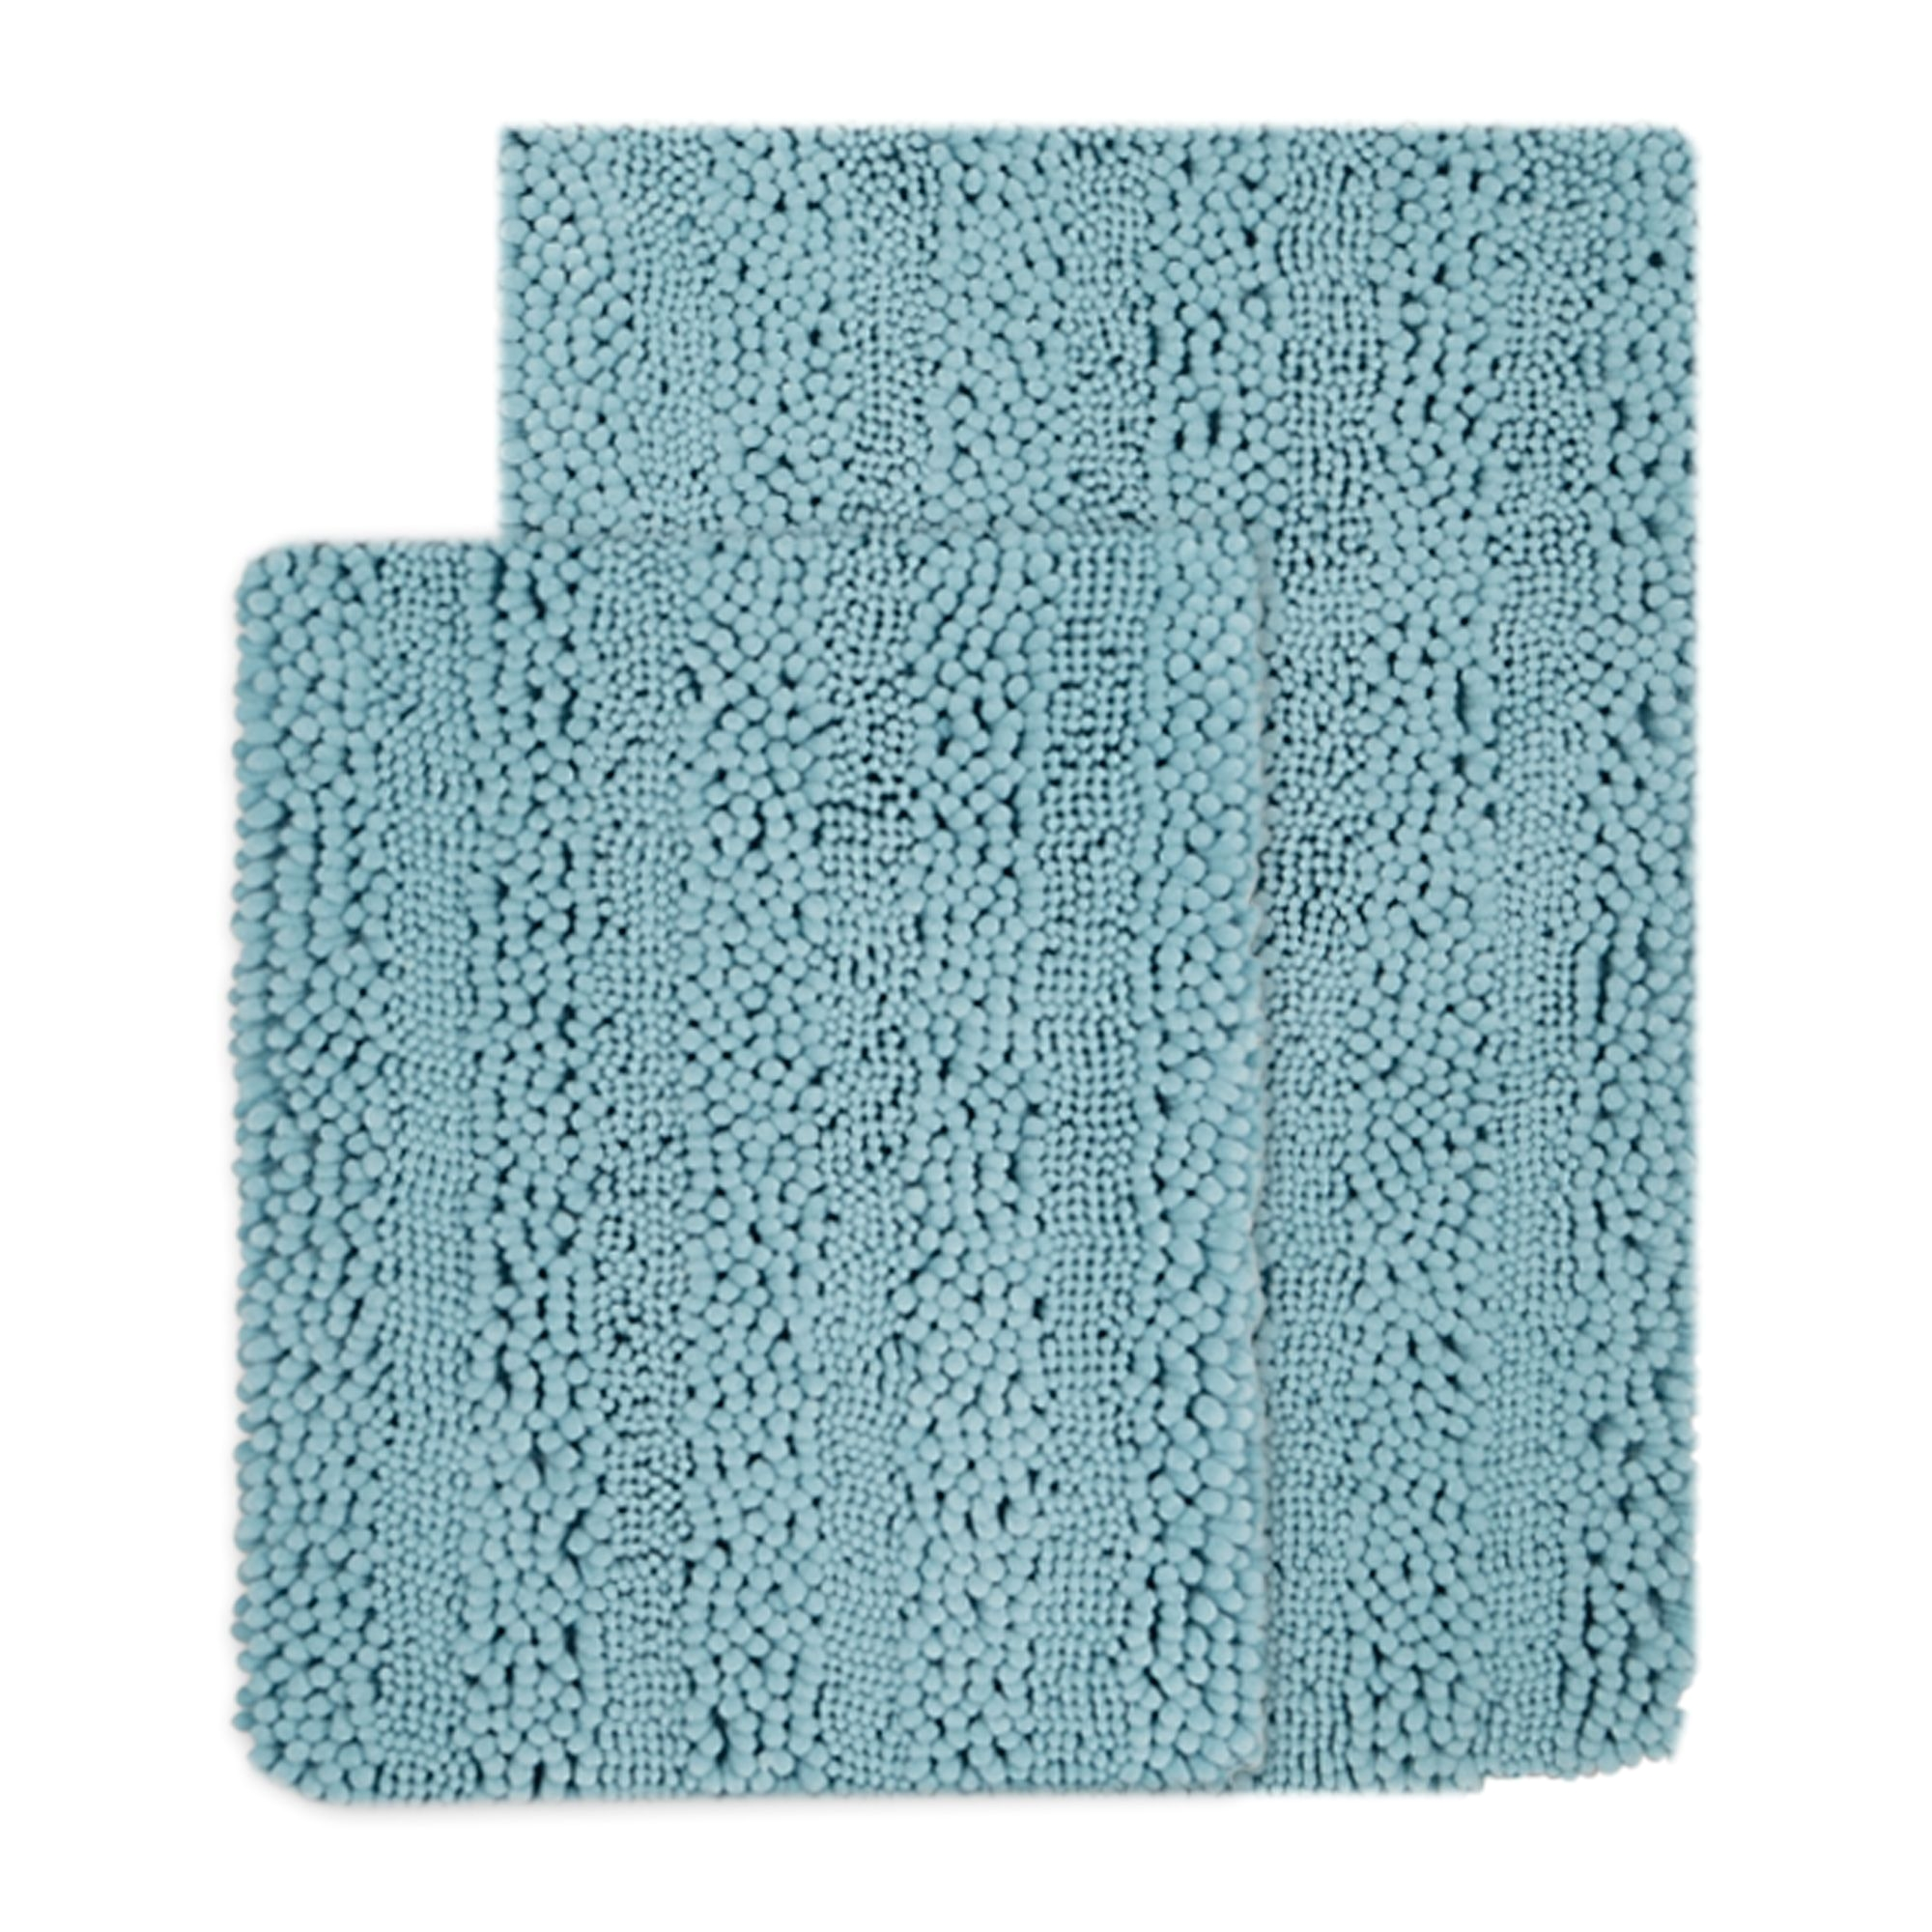 4 Piece Bathroom Rug Set Walmart 2 Piece San Remo Chenille Fingers Bath Rug Set Blue Gordmans